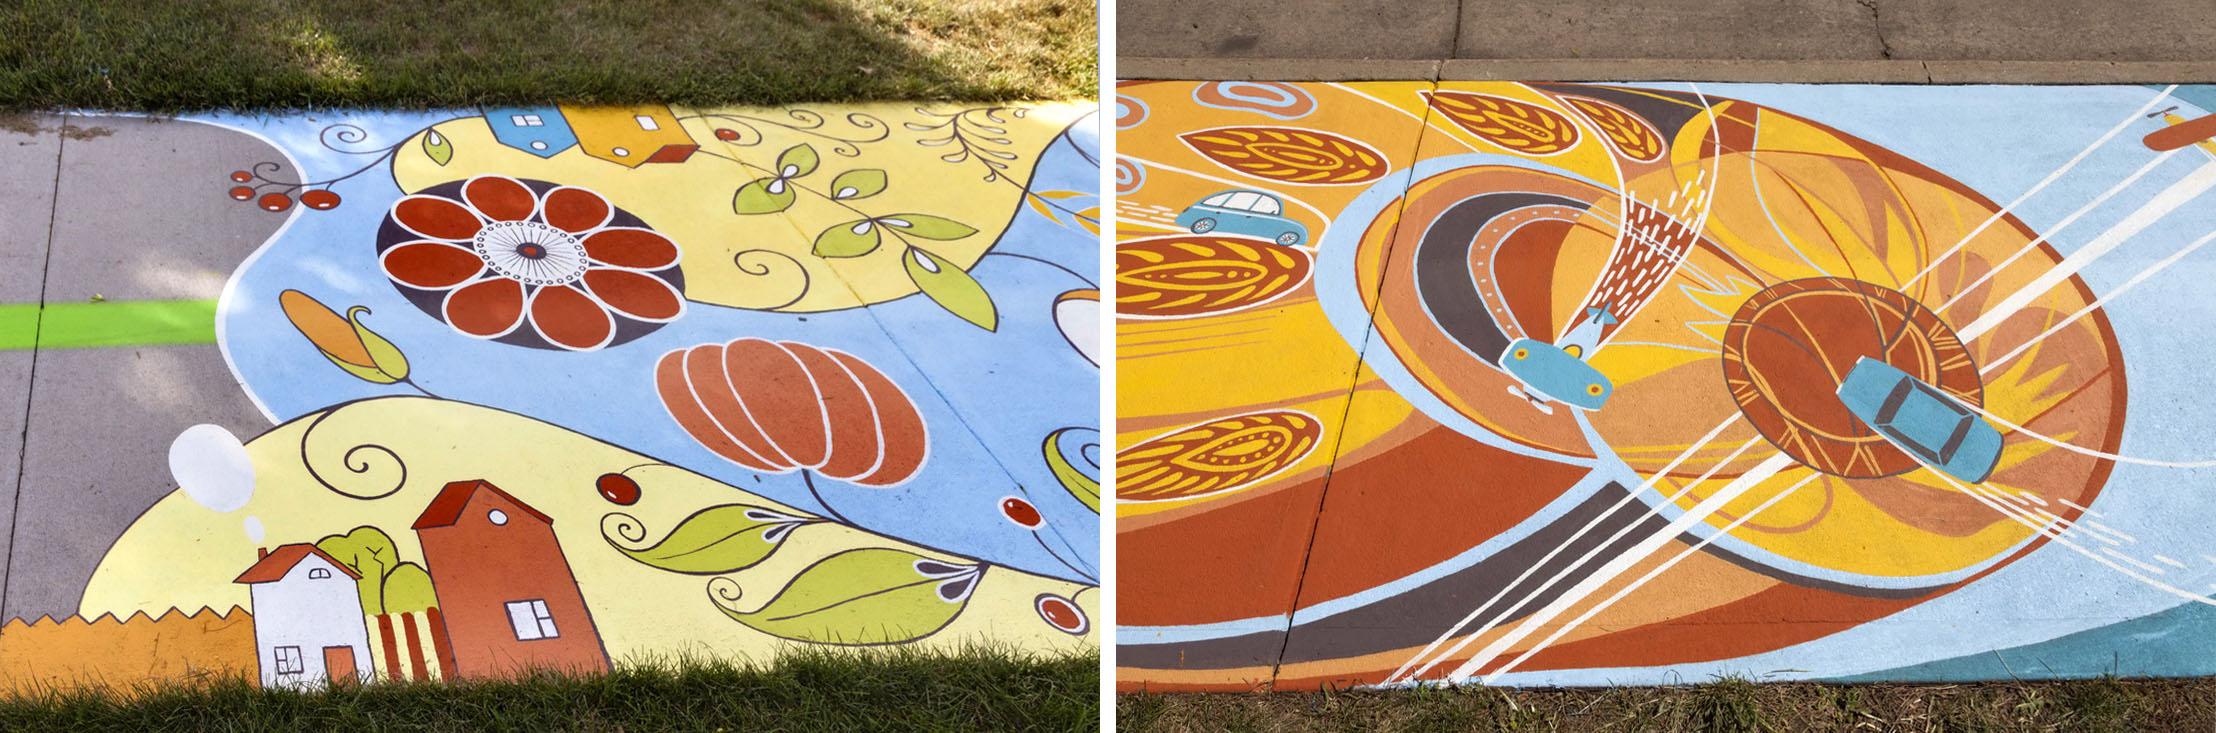 ground mural